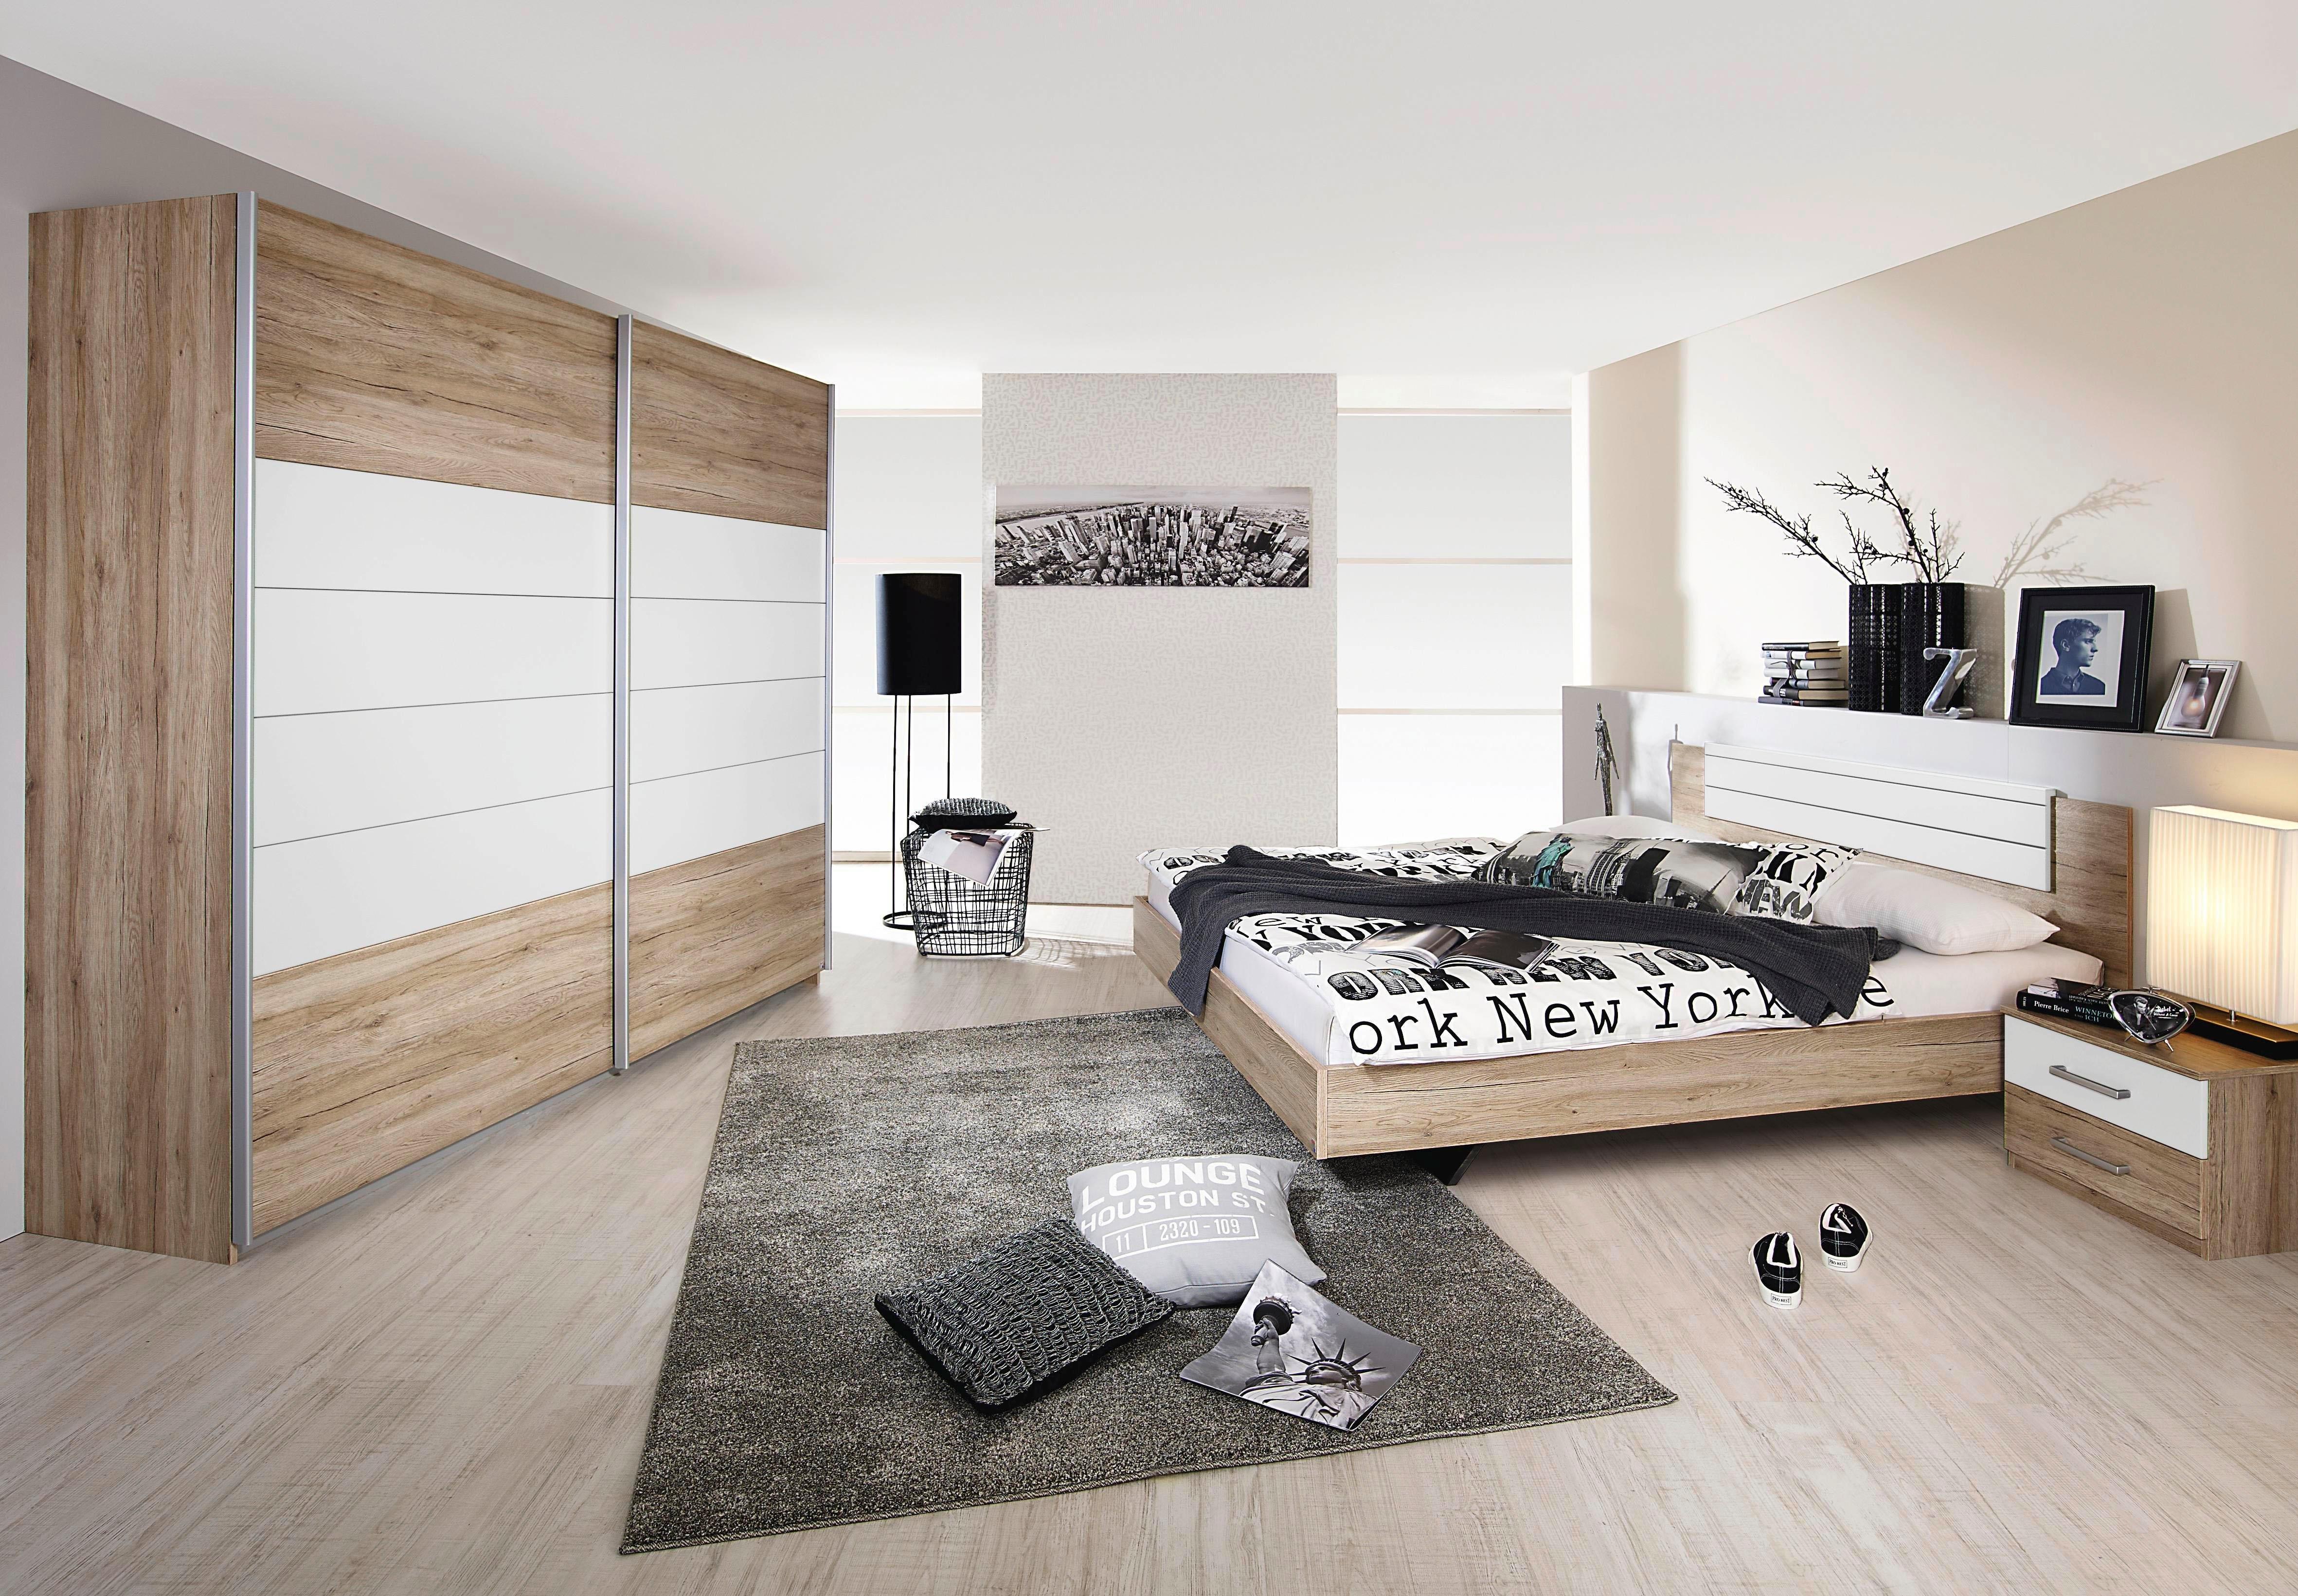 Rauch SELECT slaapkamerserie Barcelona (set, 4 stuks) - verschillende betaalmethodes